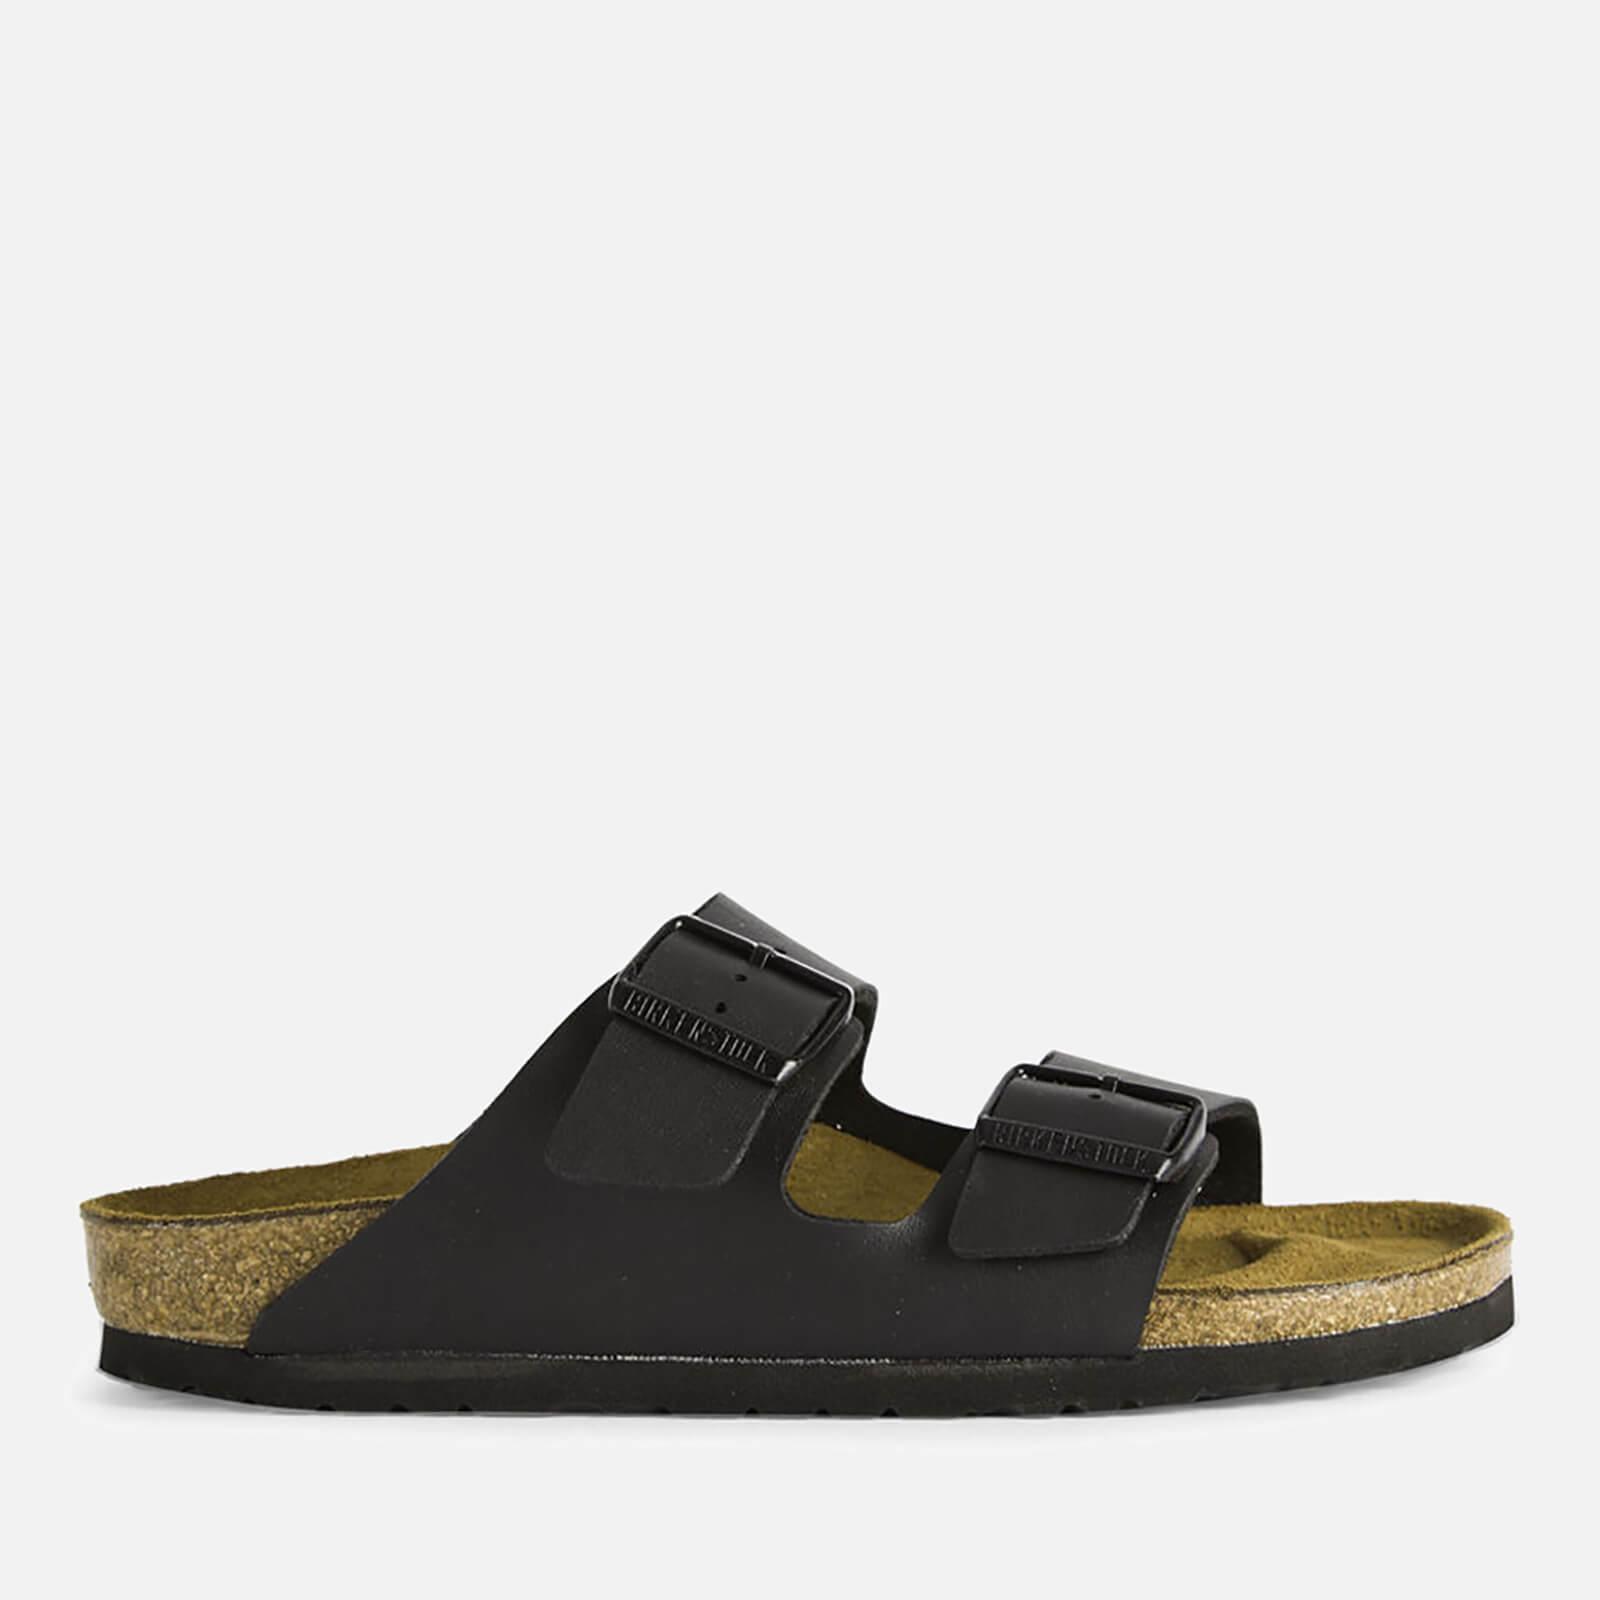 Birkenstock Women's Arizona Slim Fit Double Strap Sandals - Black - EU 41/UK 7.5